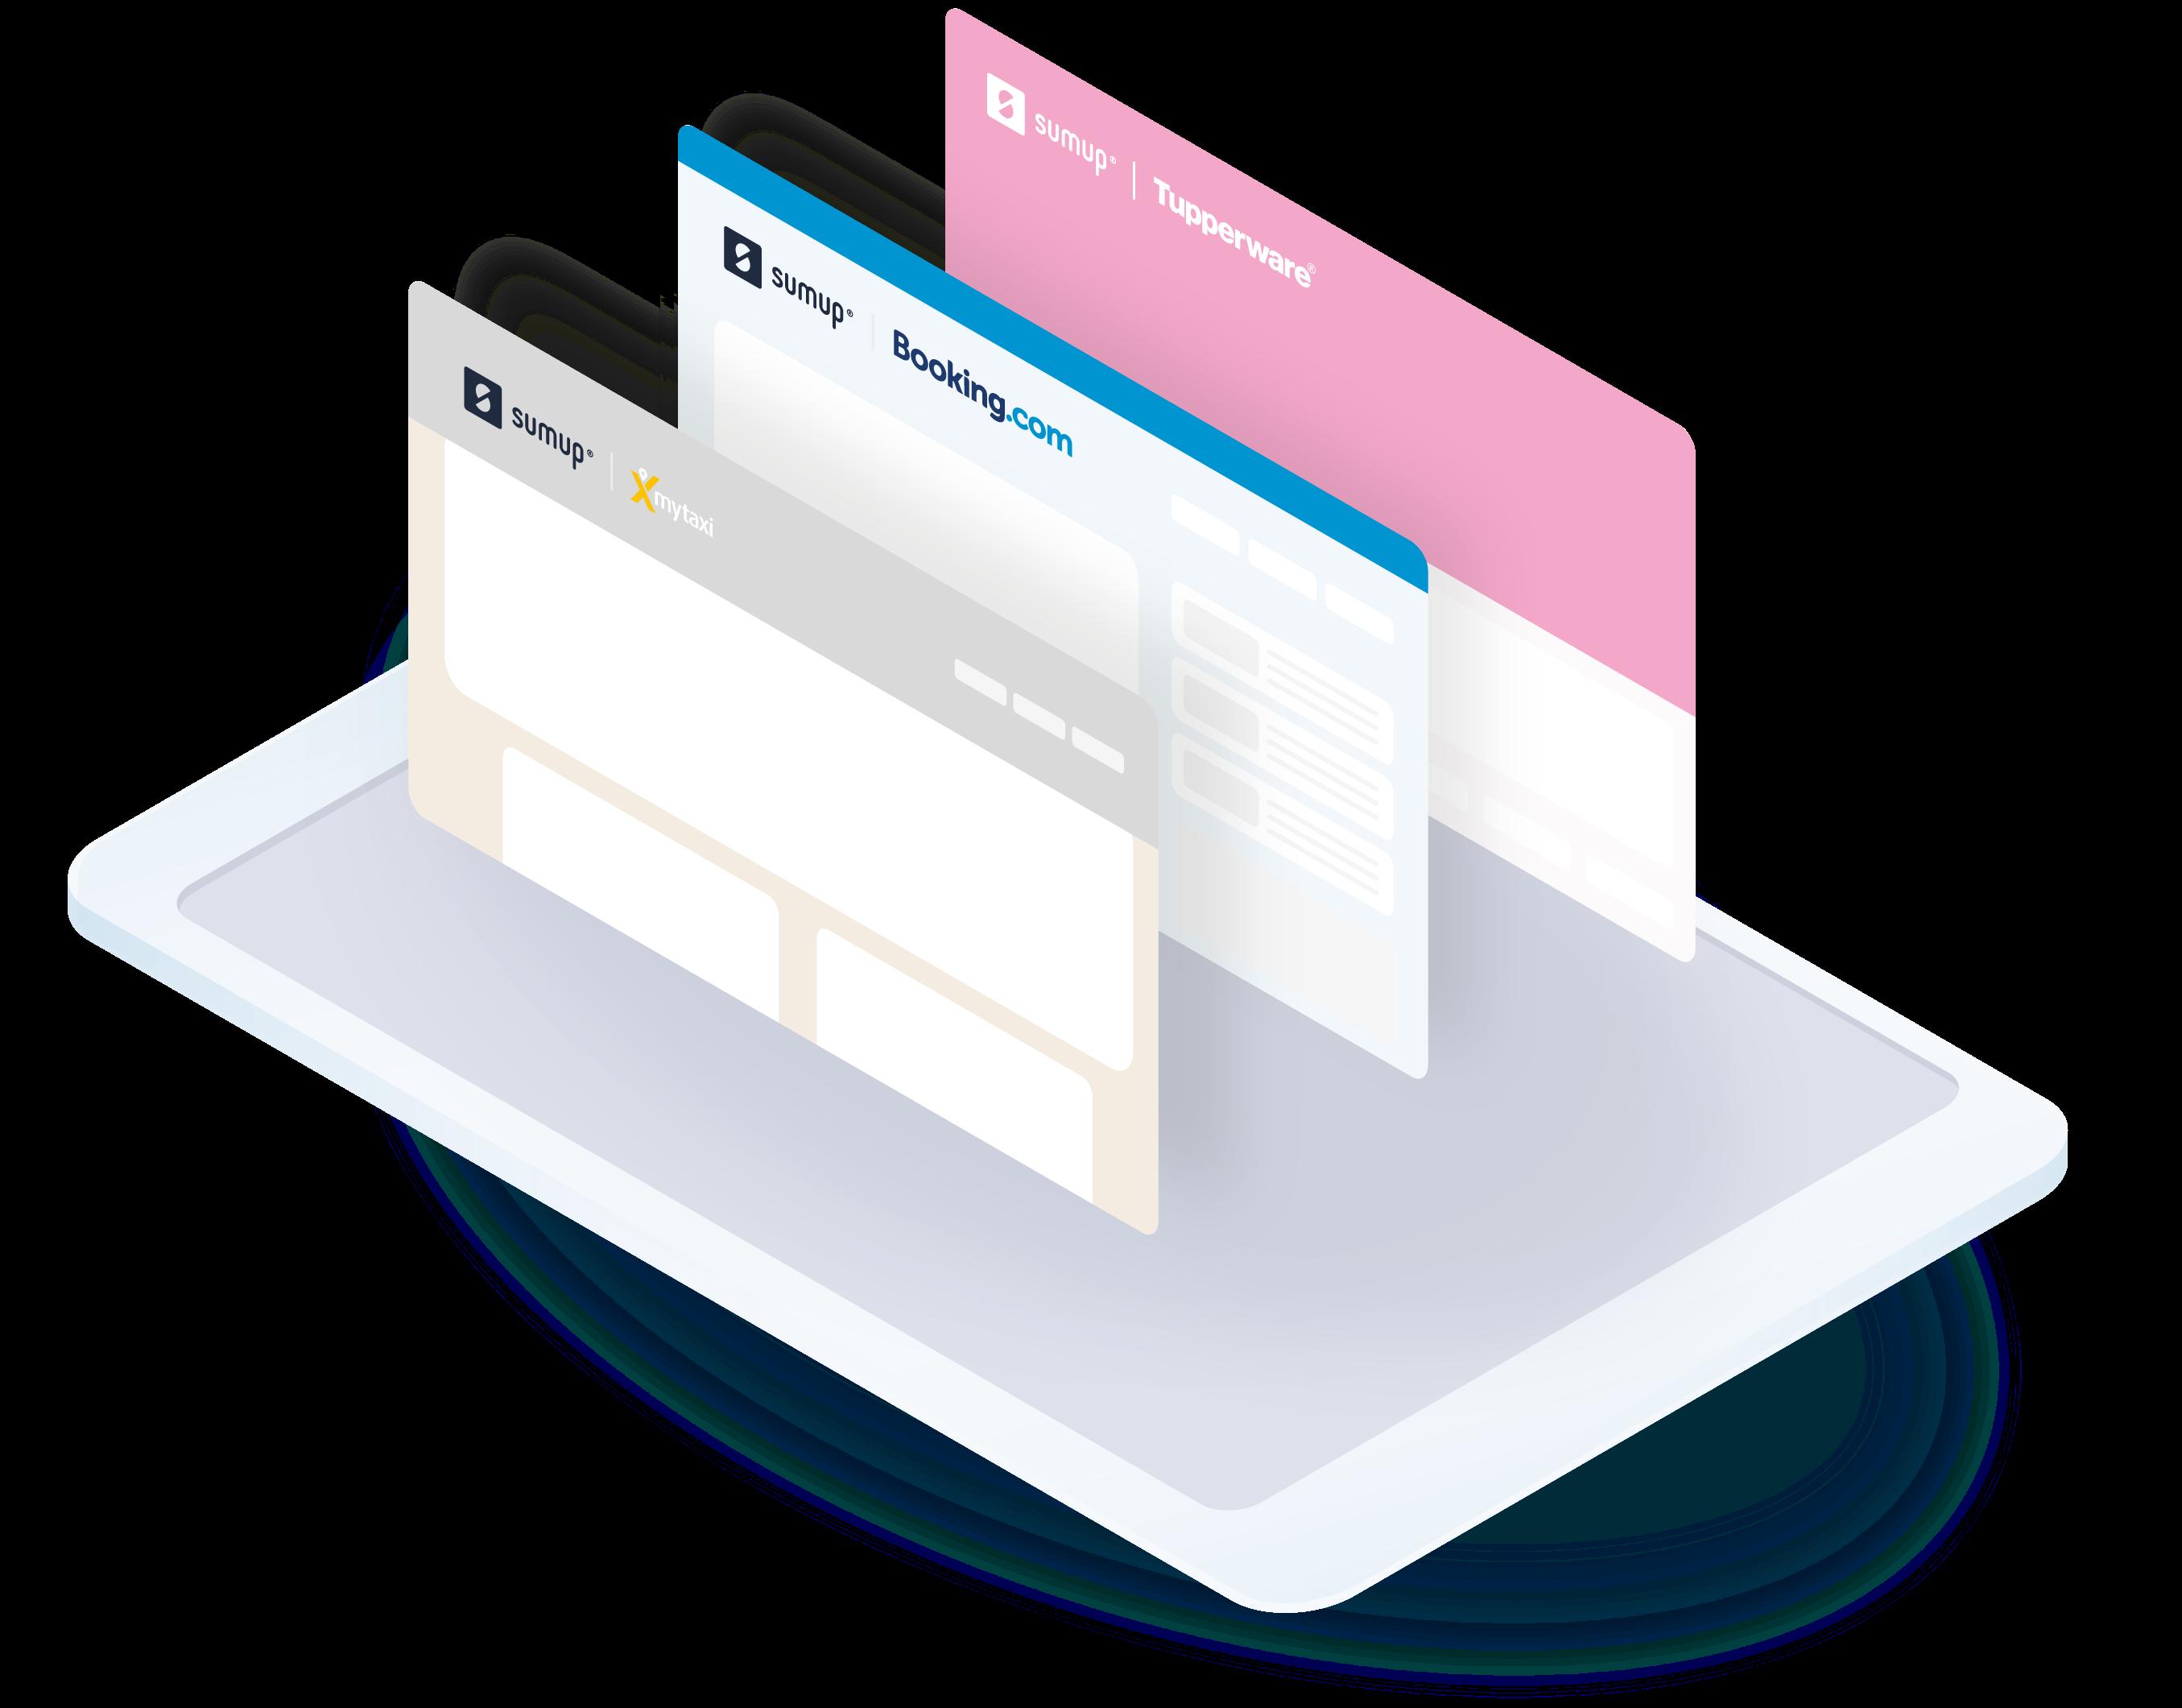 Partner with SumUp - Global Mobile Credit Card Reader Provider